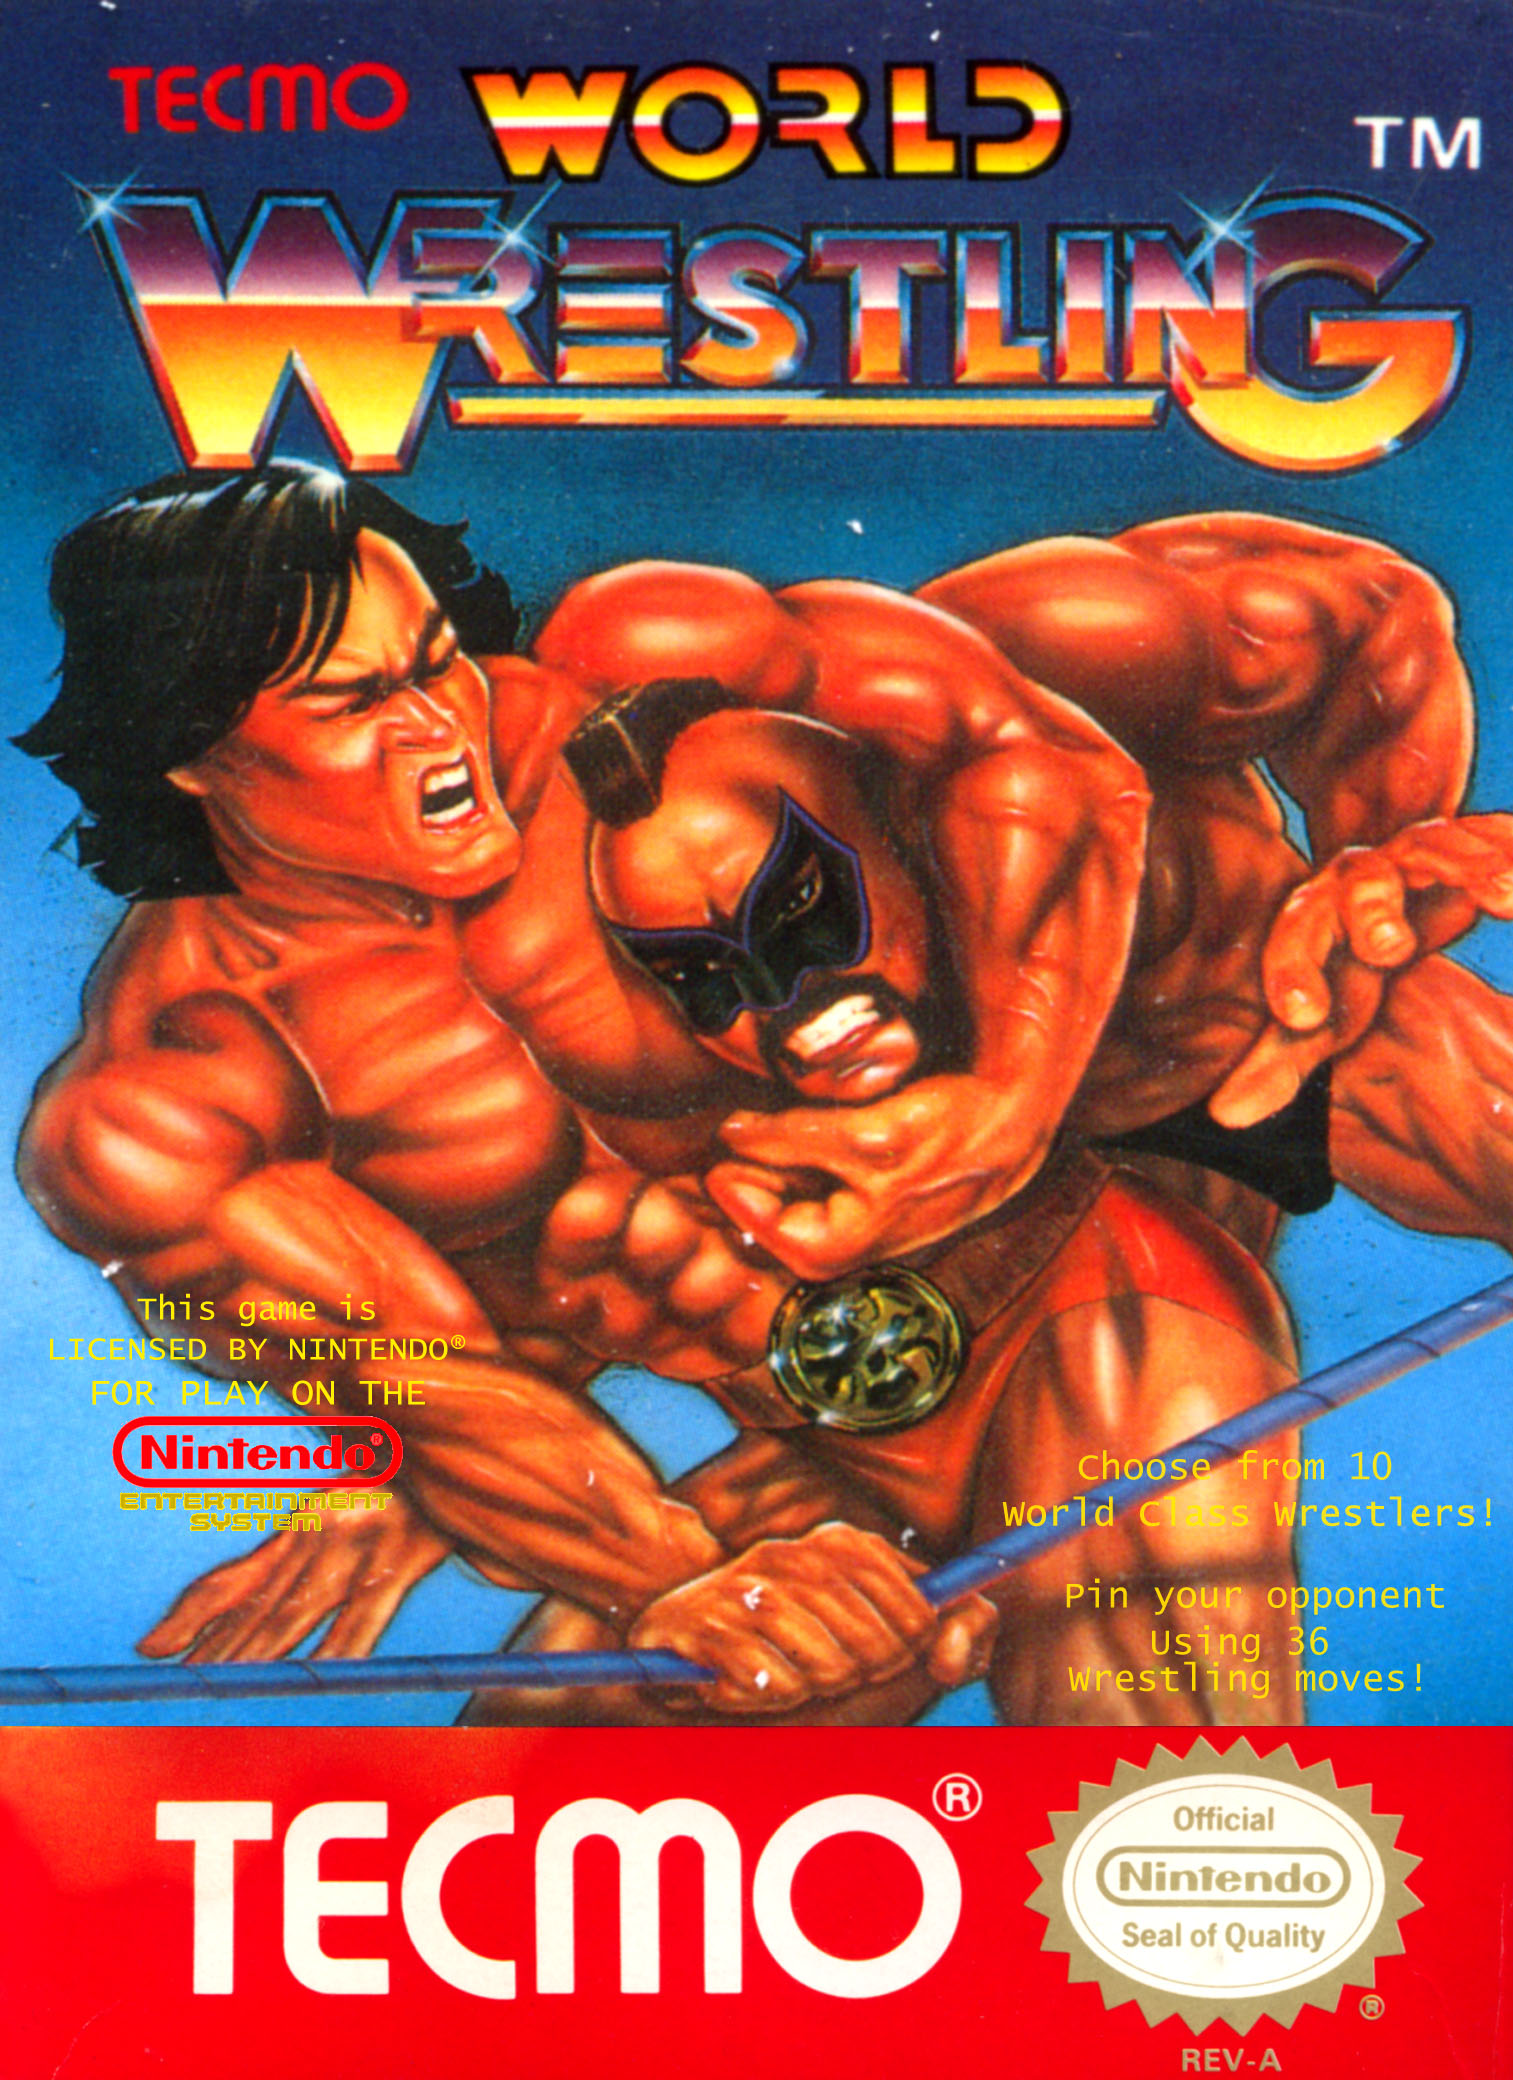 Le Topic des jeux de Catch (Pro Wrestling) Tecmo_World_Wrestling_Coverart-1